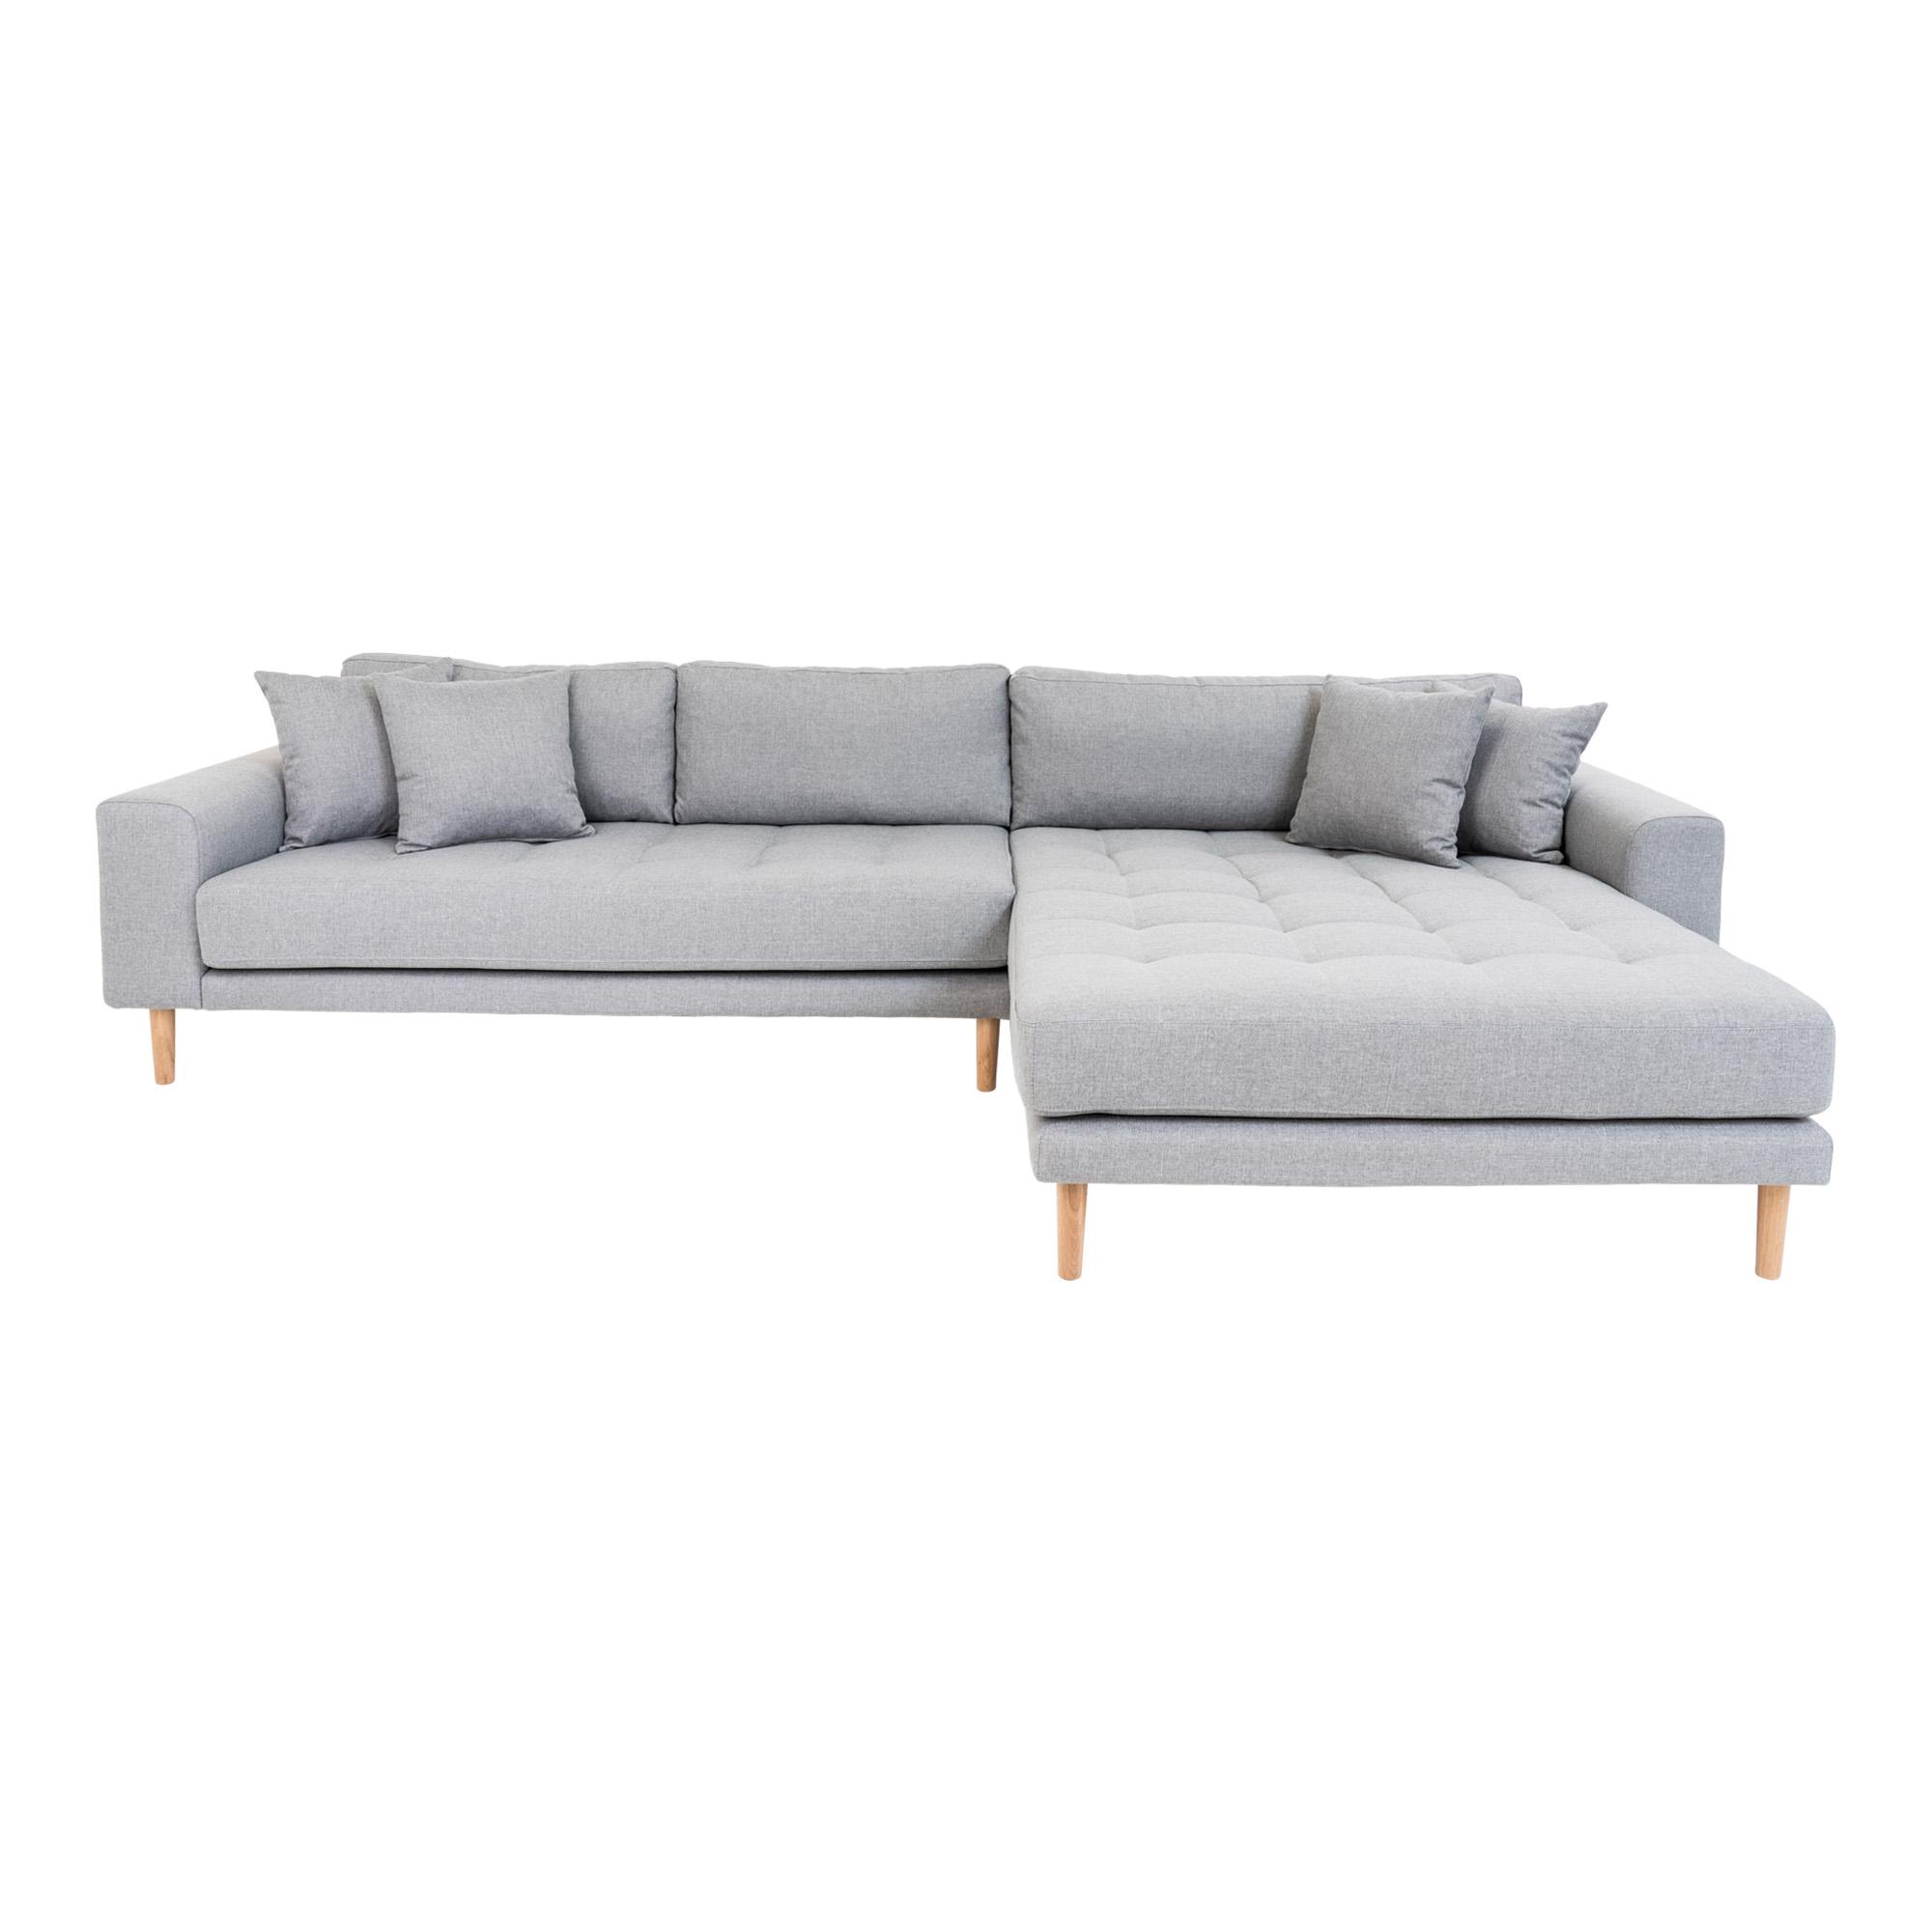 HOUSE NORDIC Lido sofa, m. højrevendt chaiselong - lysegrå polyester